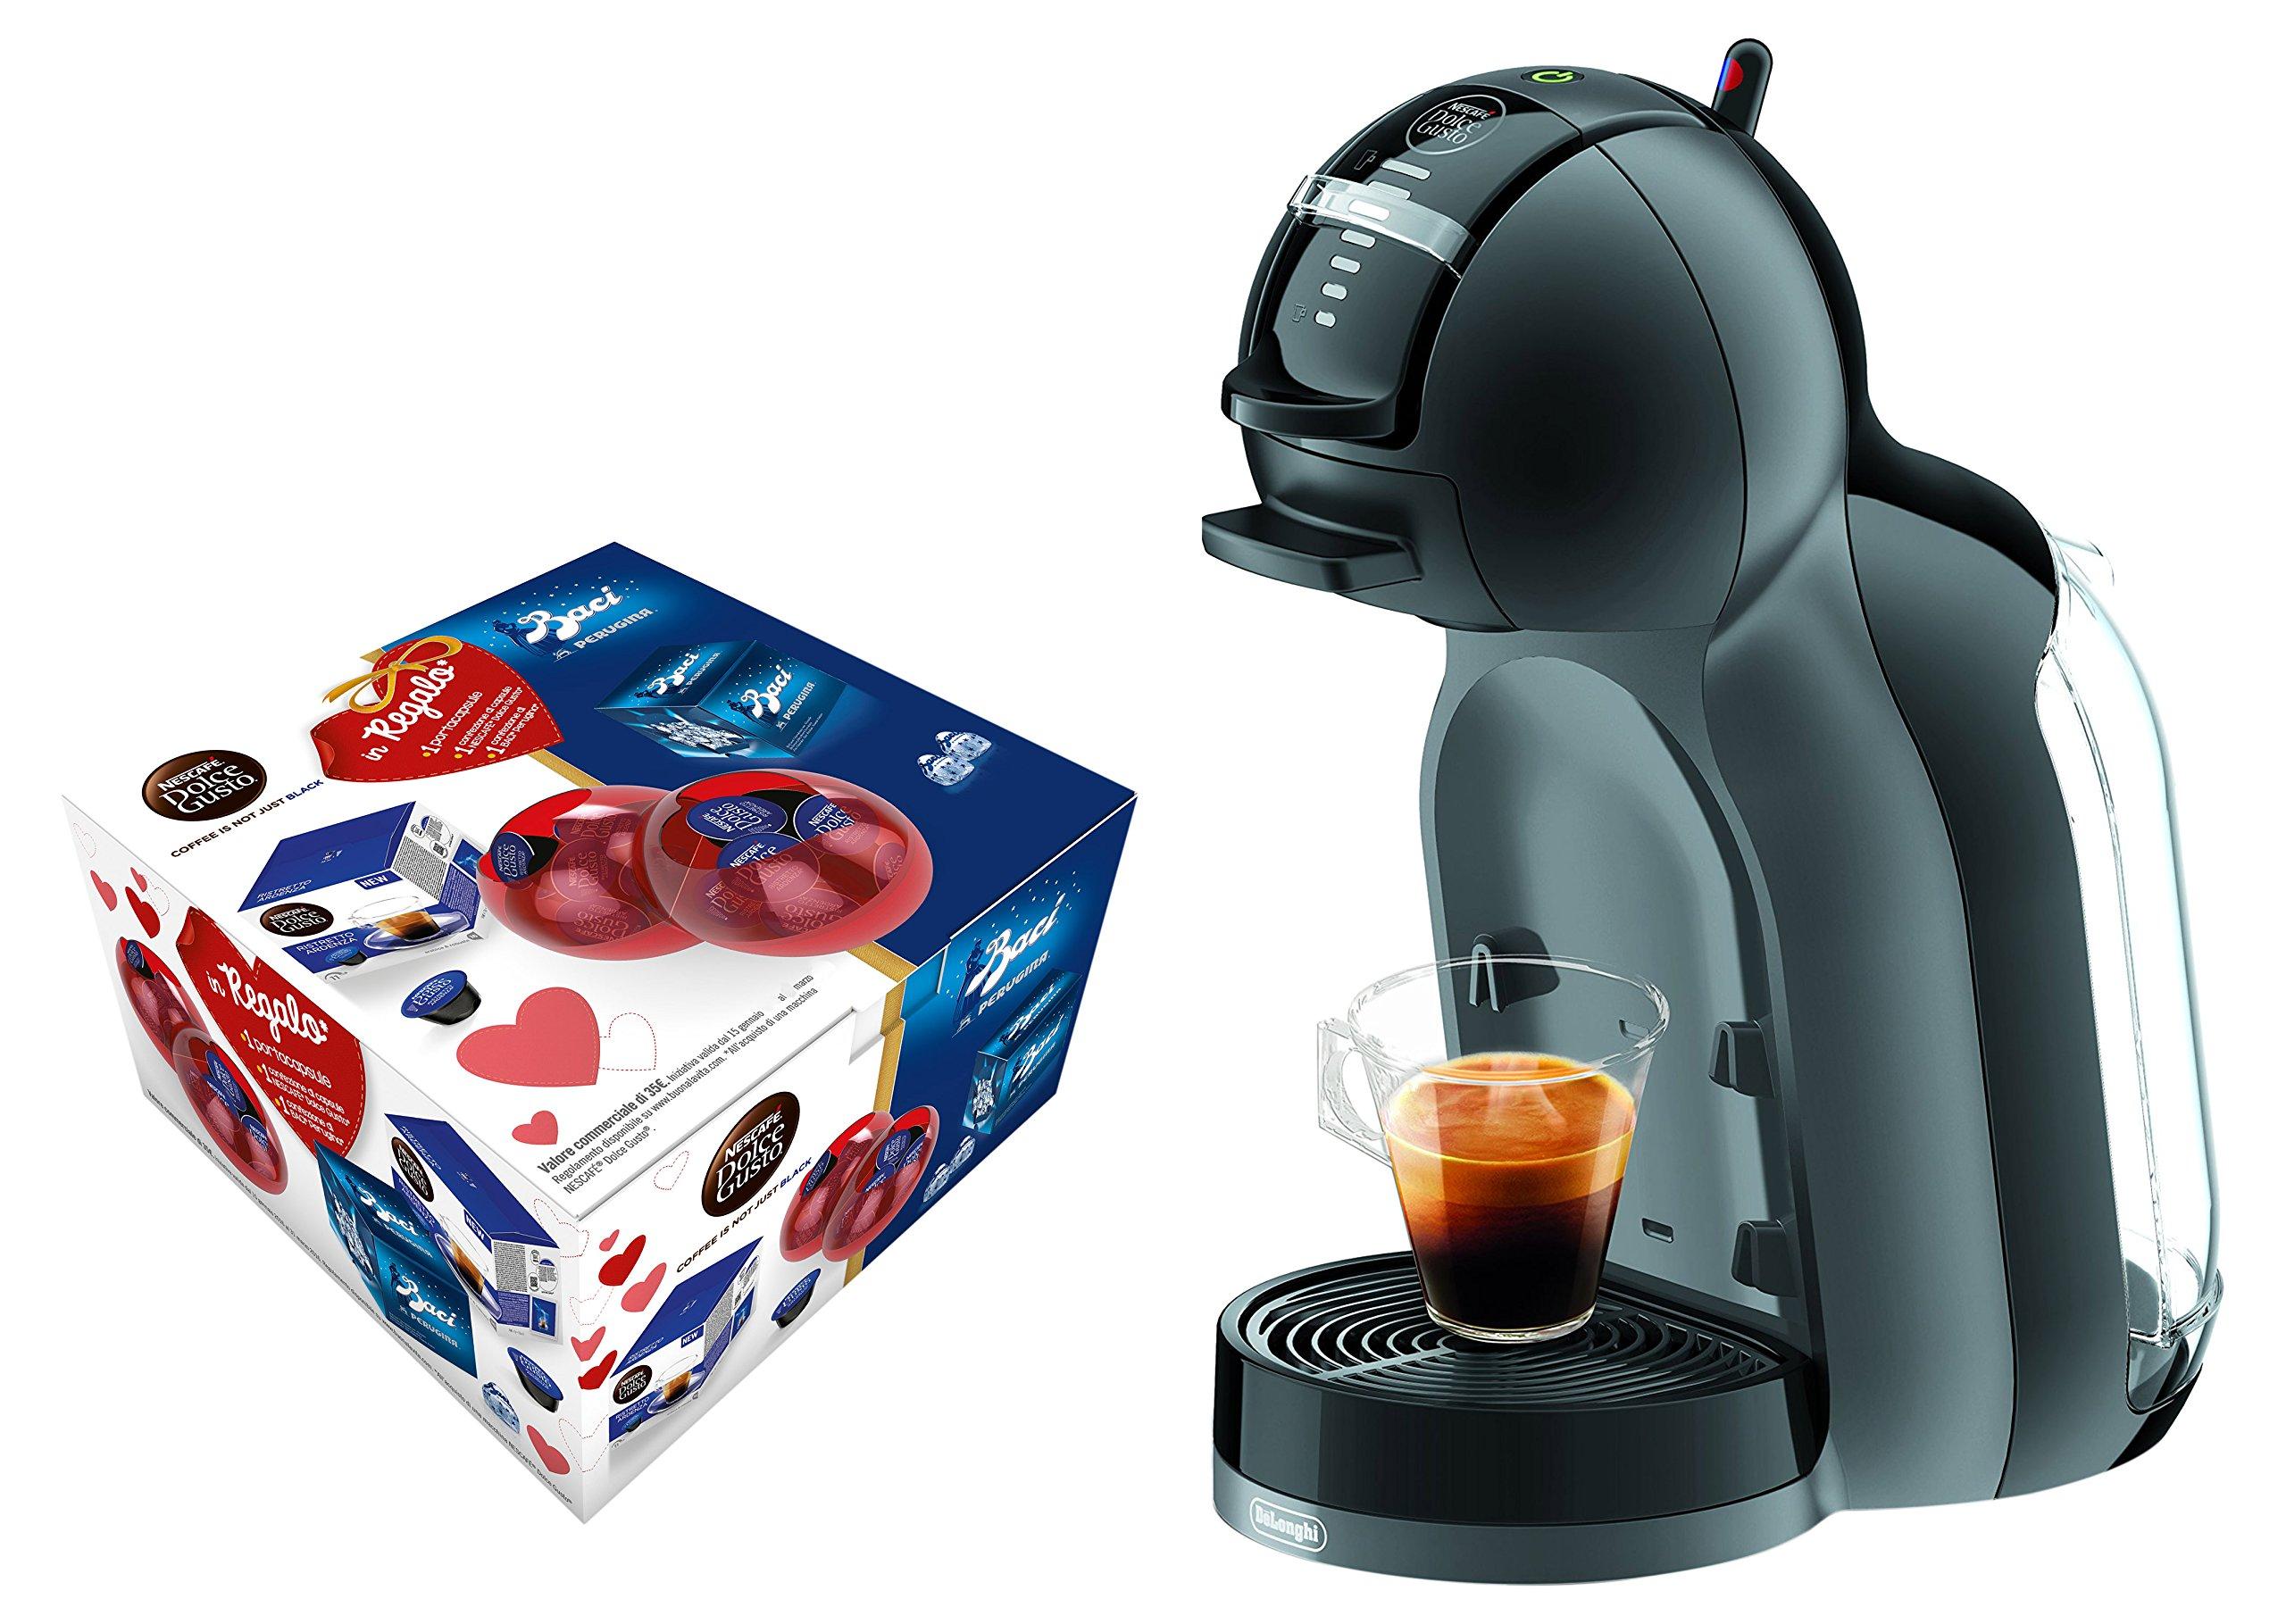 DeLonghi Mini Me EDG305.BG Valentino Independiente Máquina de café en cápsulas 0,8 L - Cafetera (Independiente, Máquina de café en cápsulas, 0,8 L, Cápsula de café, 1460 W, Negro, Gris): Amazon.es: Hogar